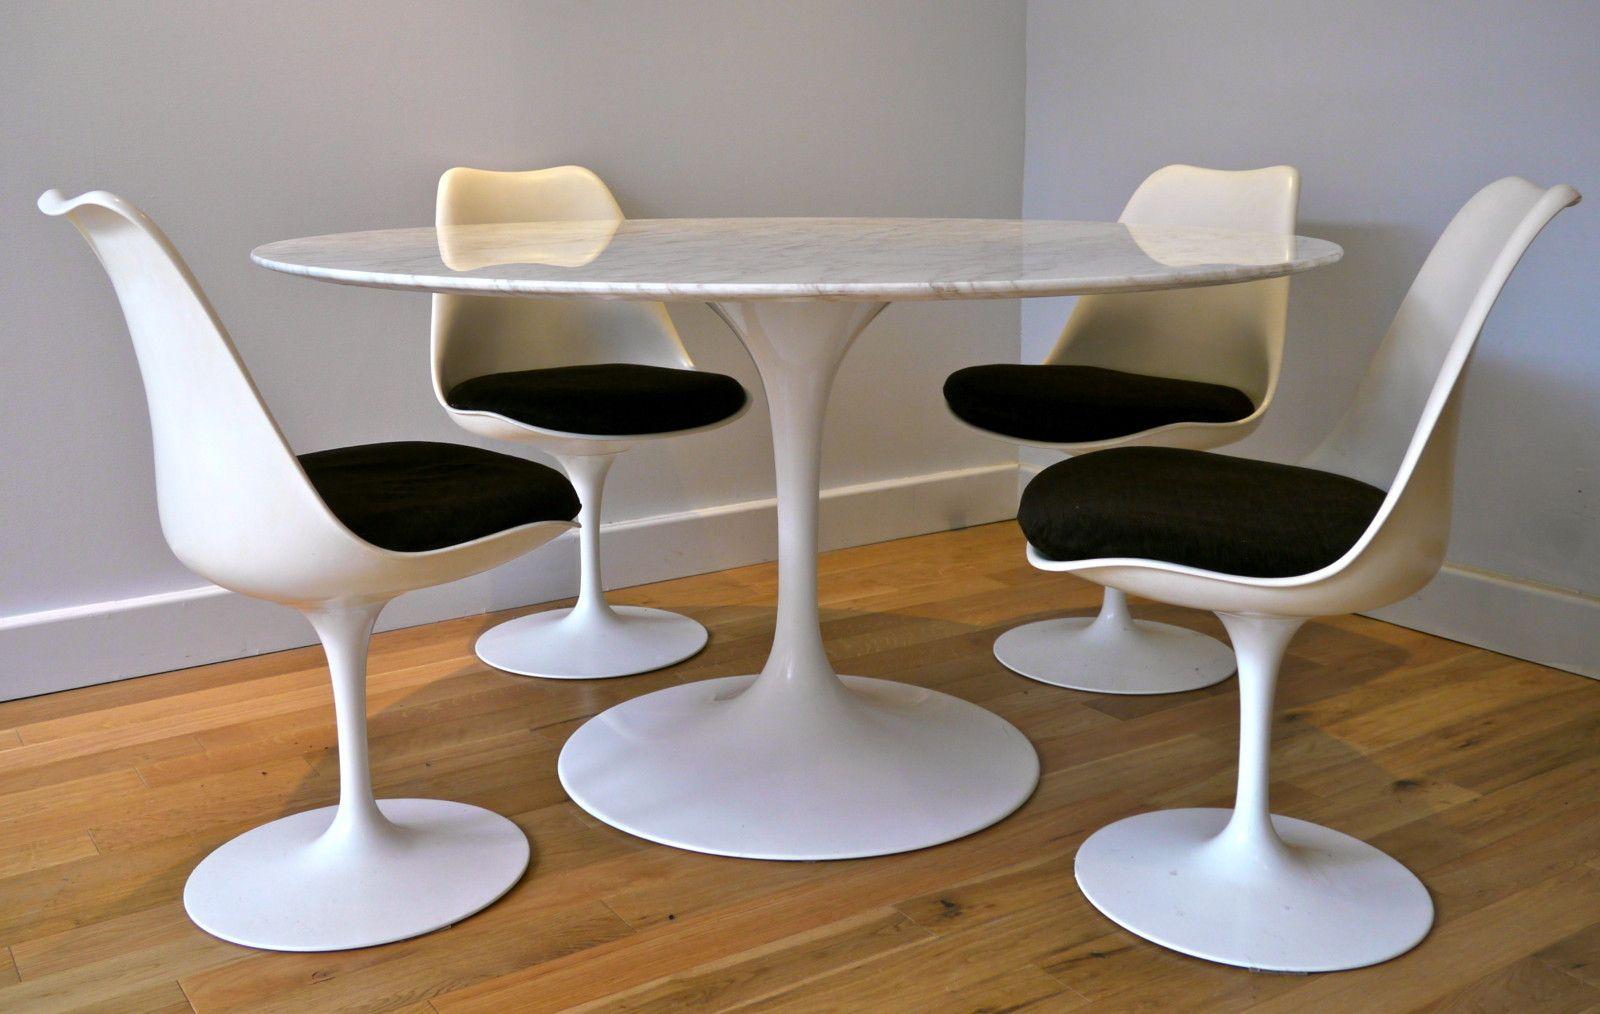 Table Florence Knoll Prix eero saarinen, table en marbre et chaises tulipe, un